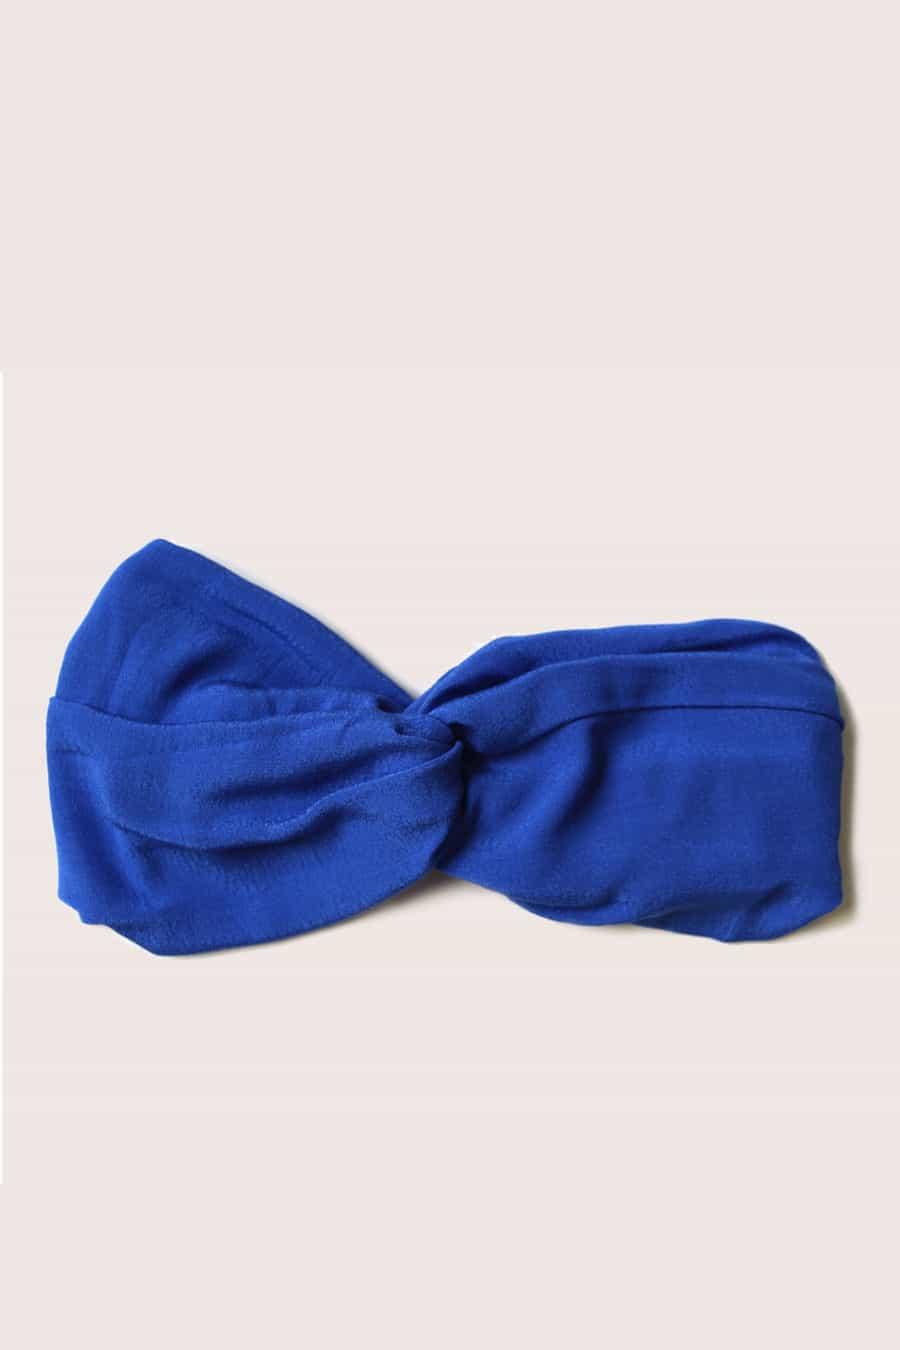 headbandlutecebleulavandepic1